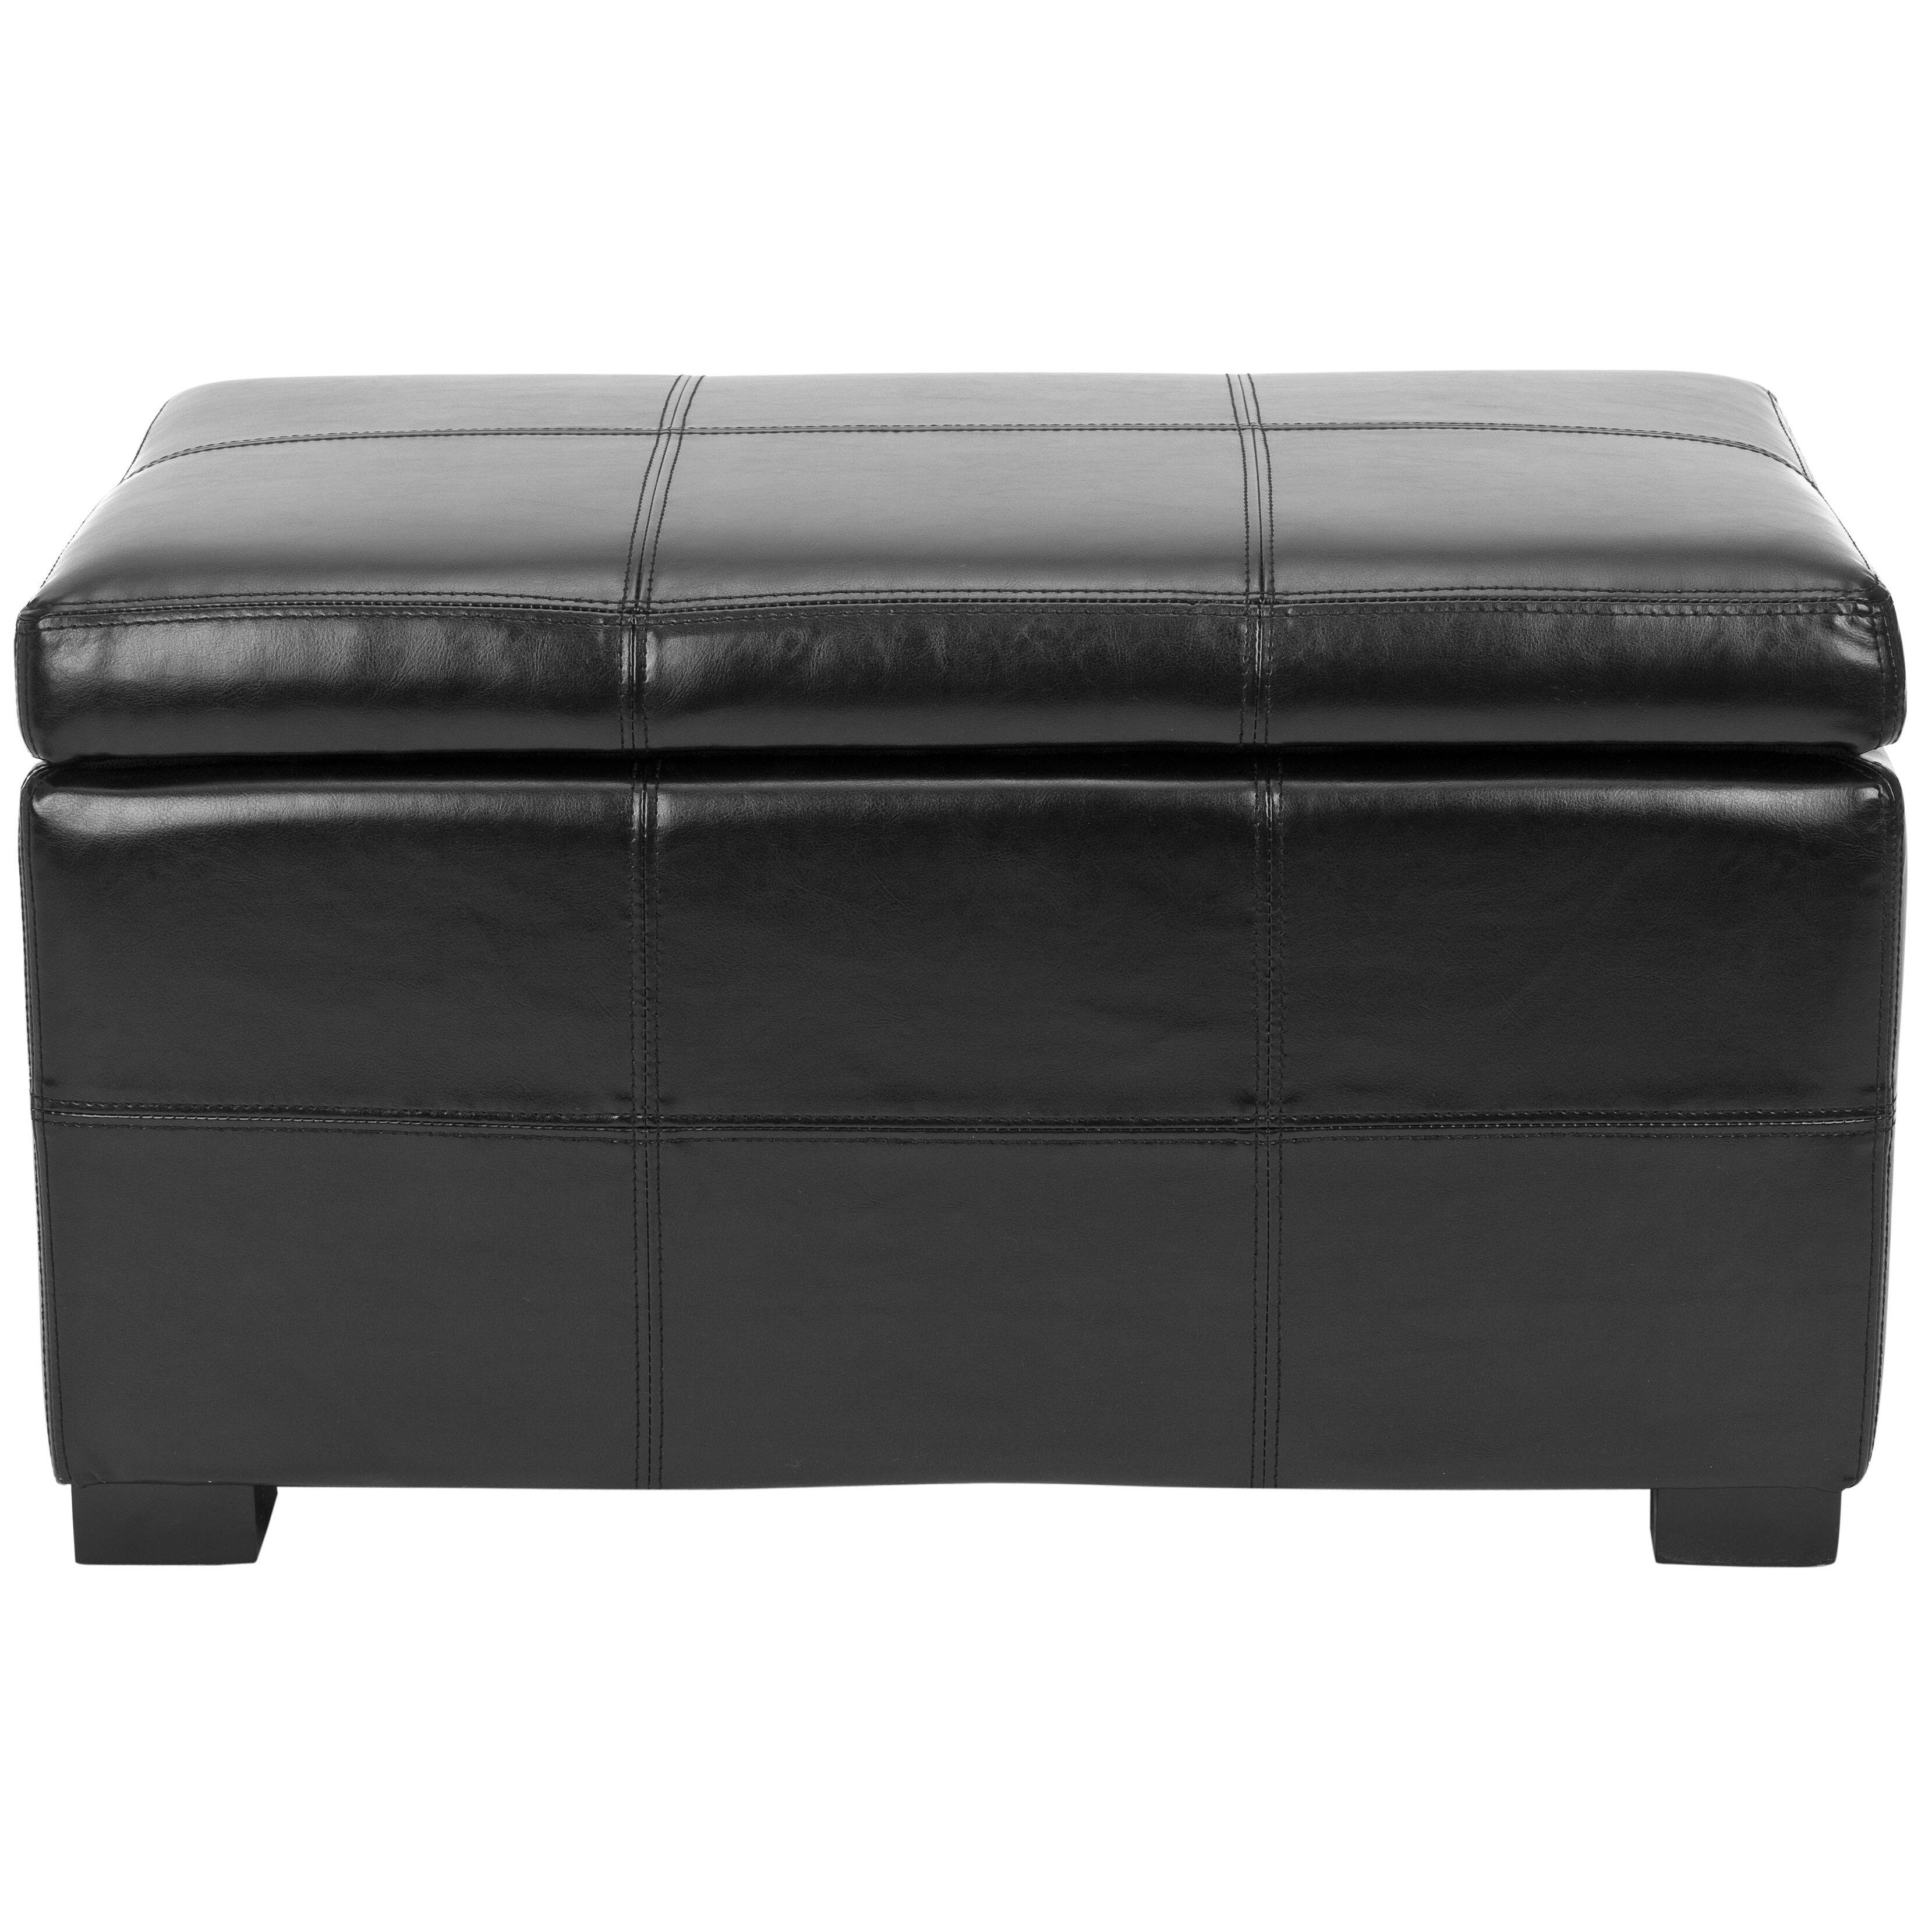 Leather Storage Bench Bedroom Safavieh Lucas Leather Bedroom Storage Bedroom Bench Reviews